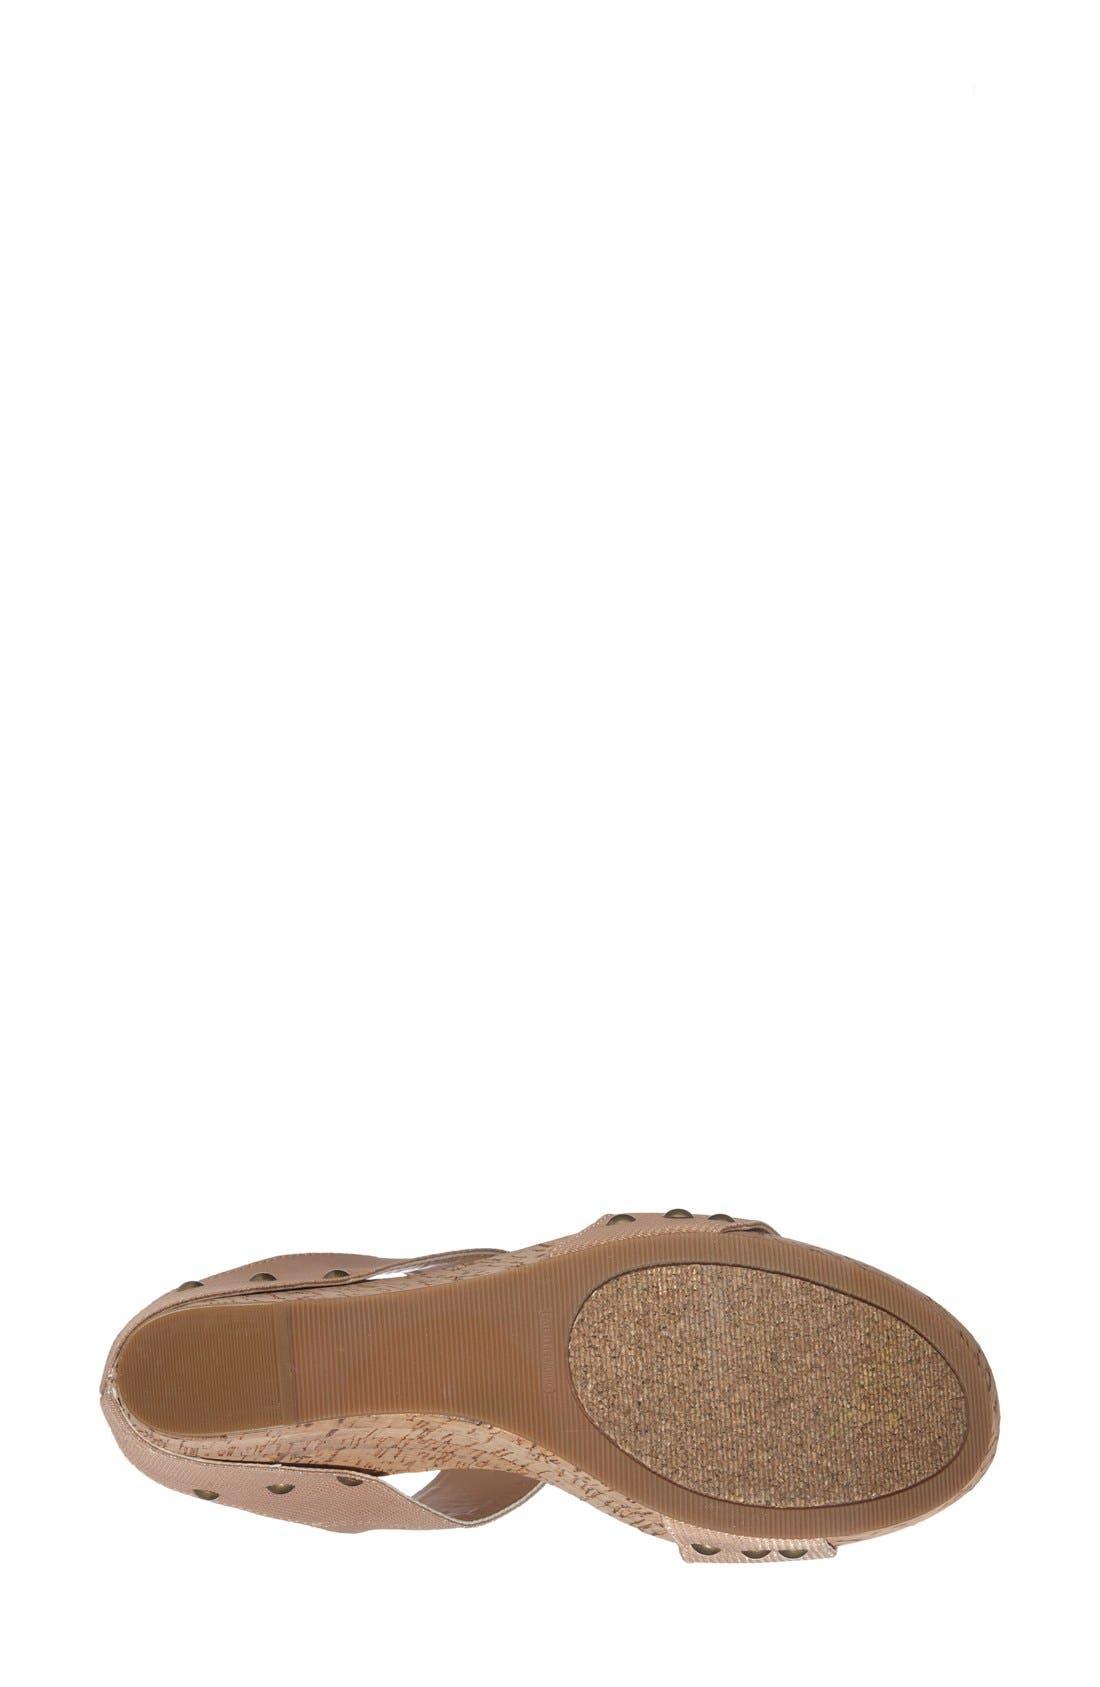 'Emilia 2' Wedge Sandal,                             Alternate thumbnail 9, color,